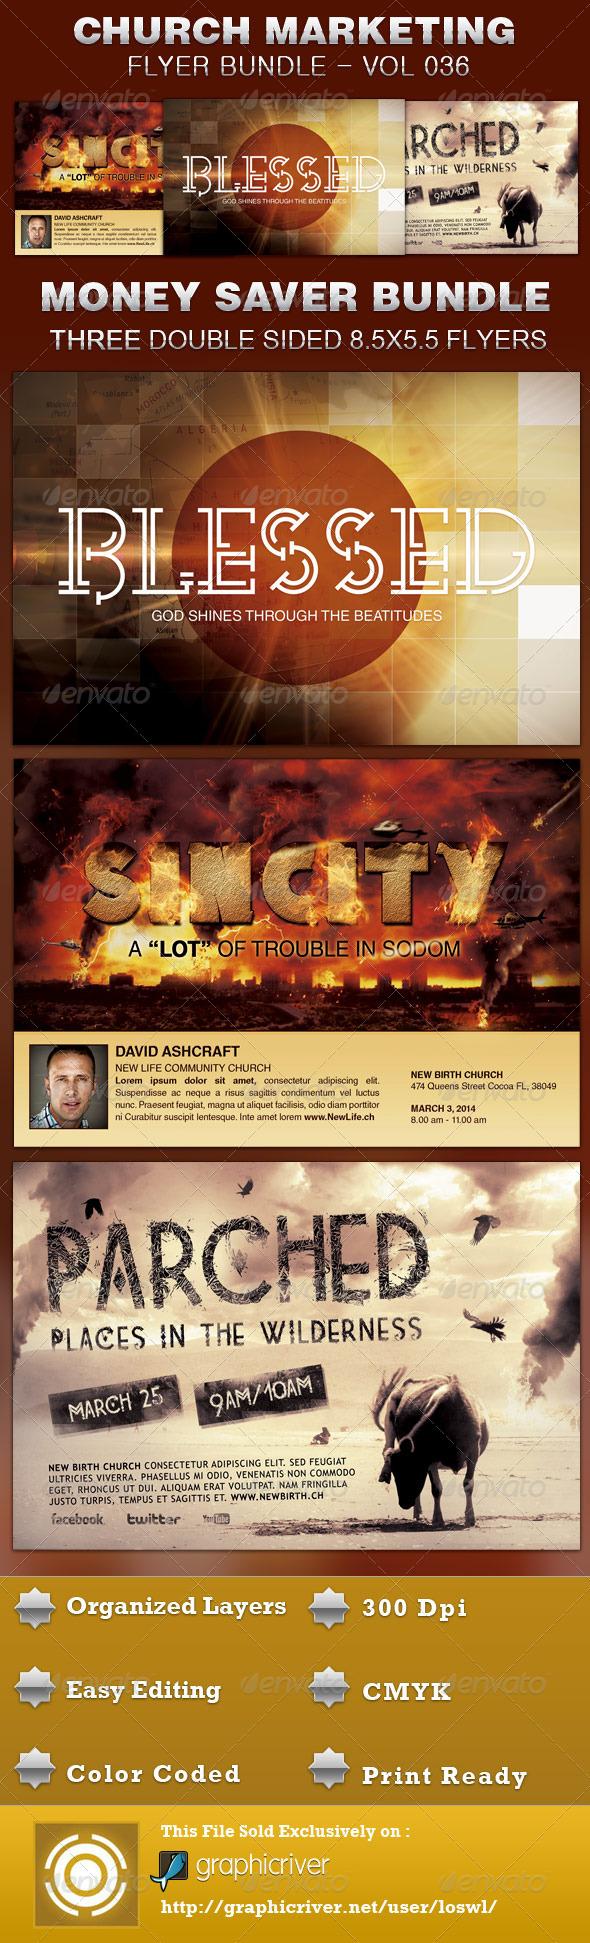 GraphicRiver Church Marketing Flyer Bundle Vol 036 5211949